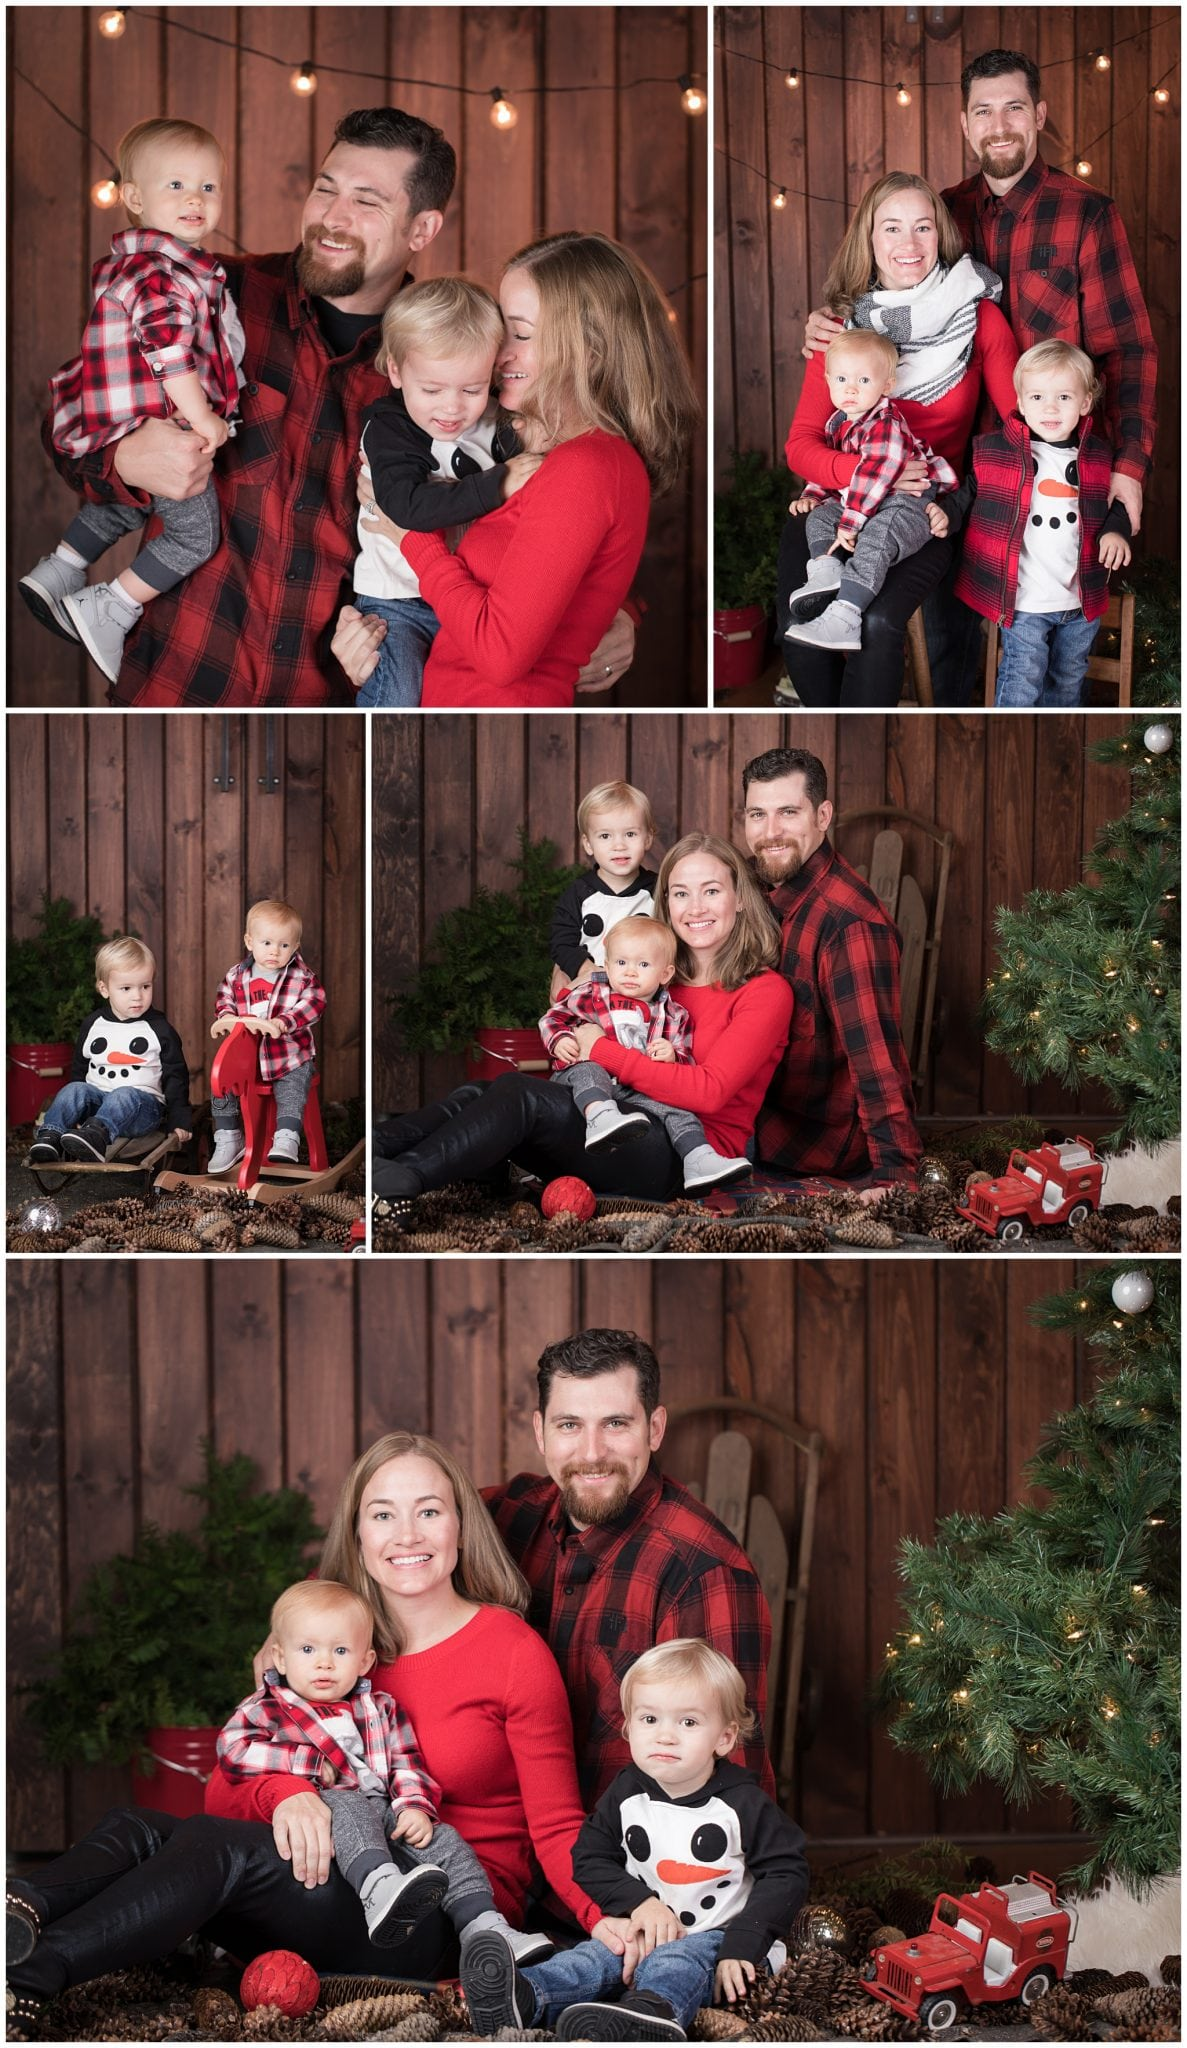 ChristmasMiniSessions_family-baby-kids_Berks-County-Reading-PA_0004.jpg